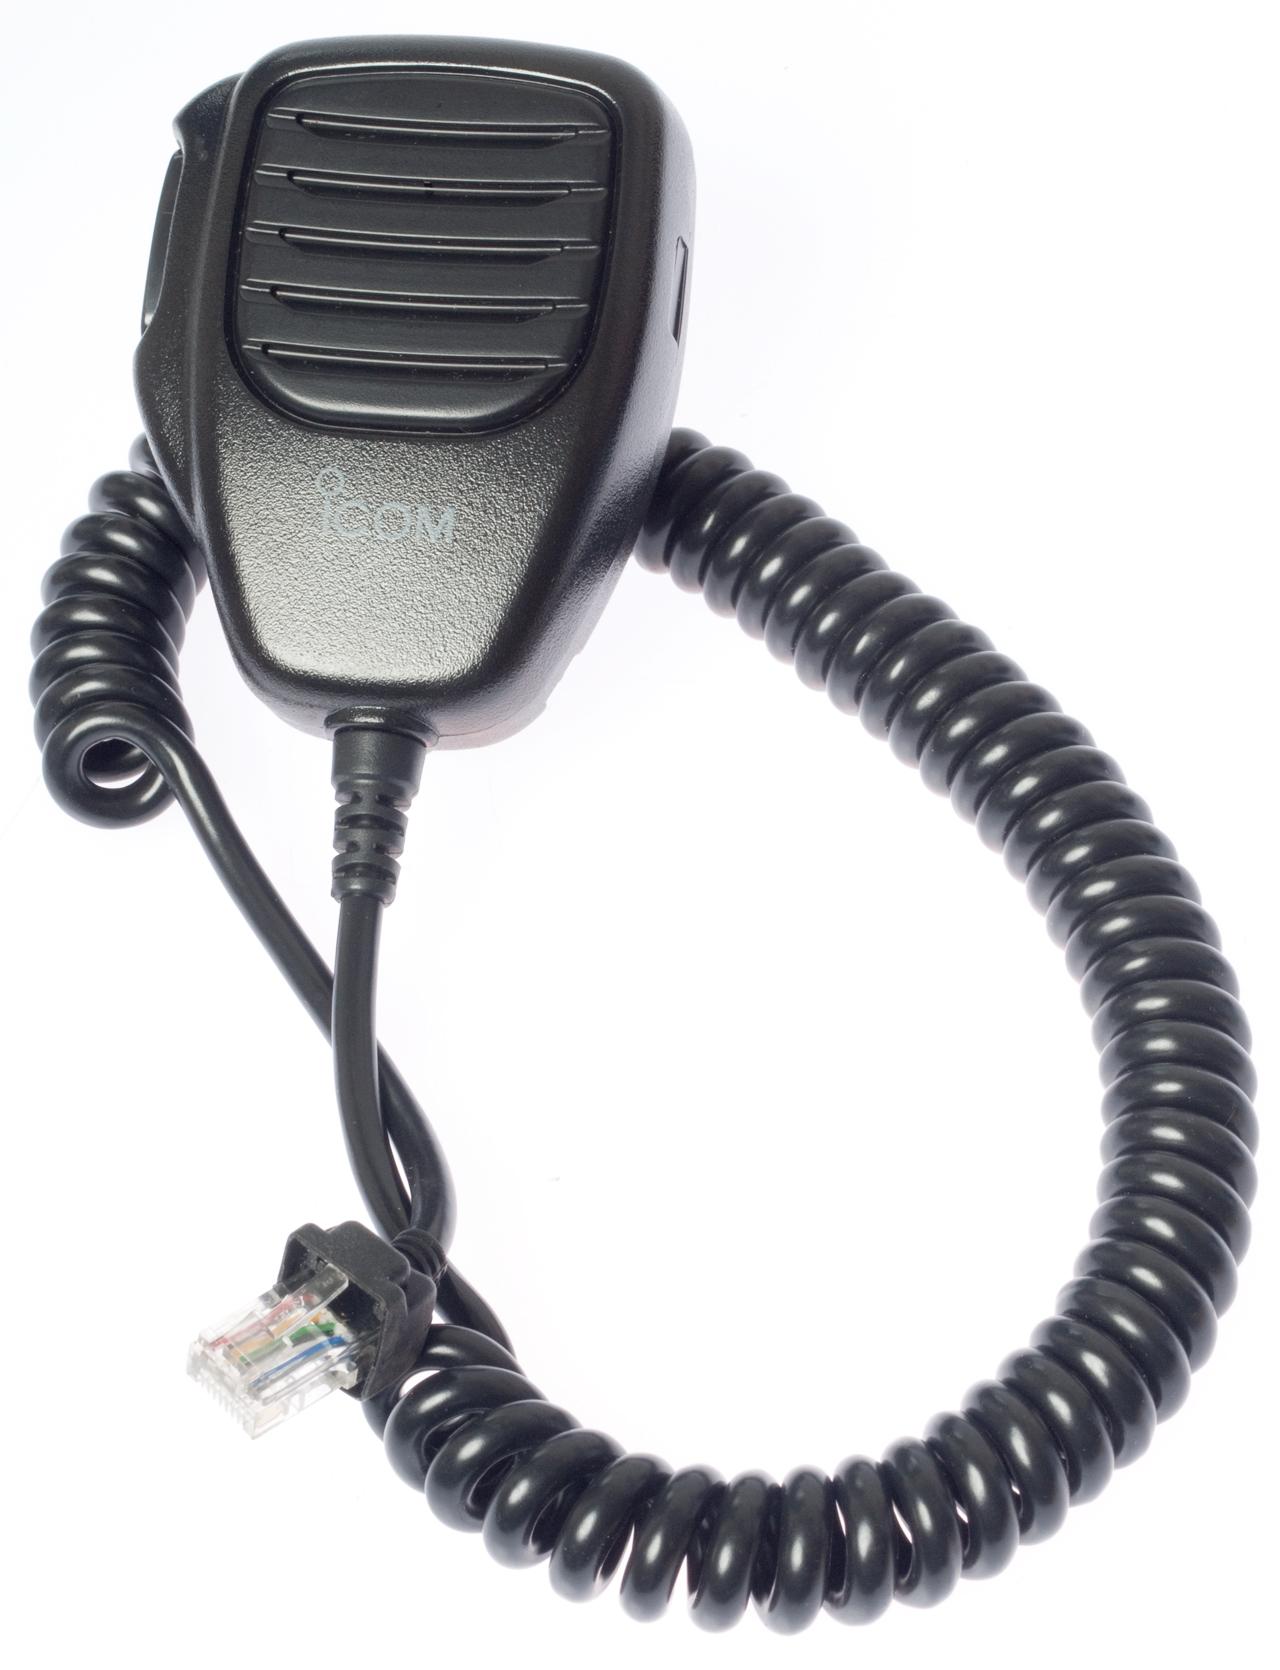 hm 103 microphone wiring diagrams circuit diagram templatehm 103 microphone wiring diagrams wiring diagramhm 103 microphone wiring diagrams wiring diagrams schematicicom 706 mk